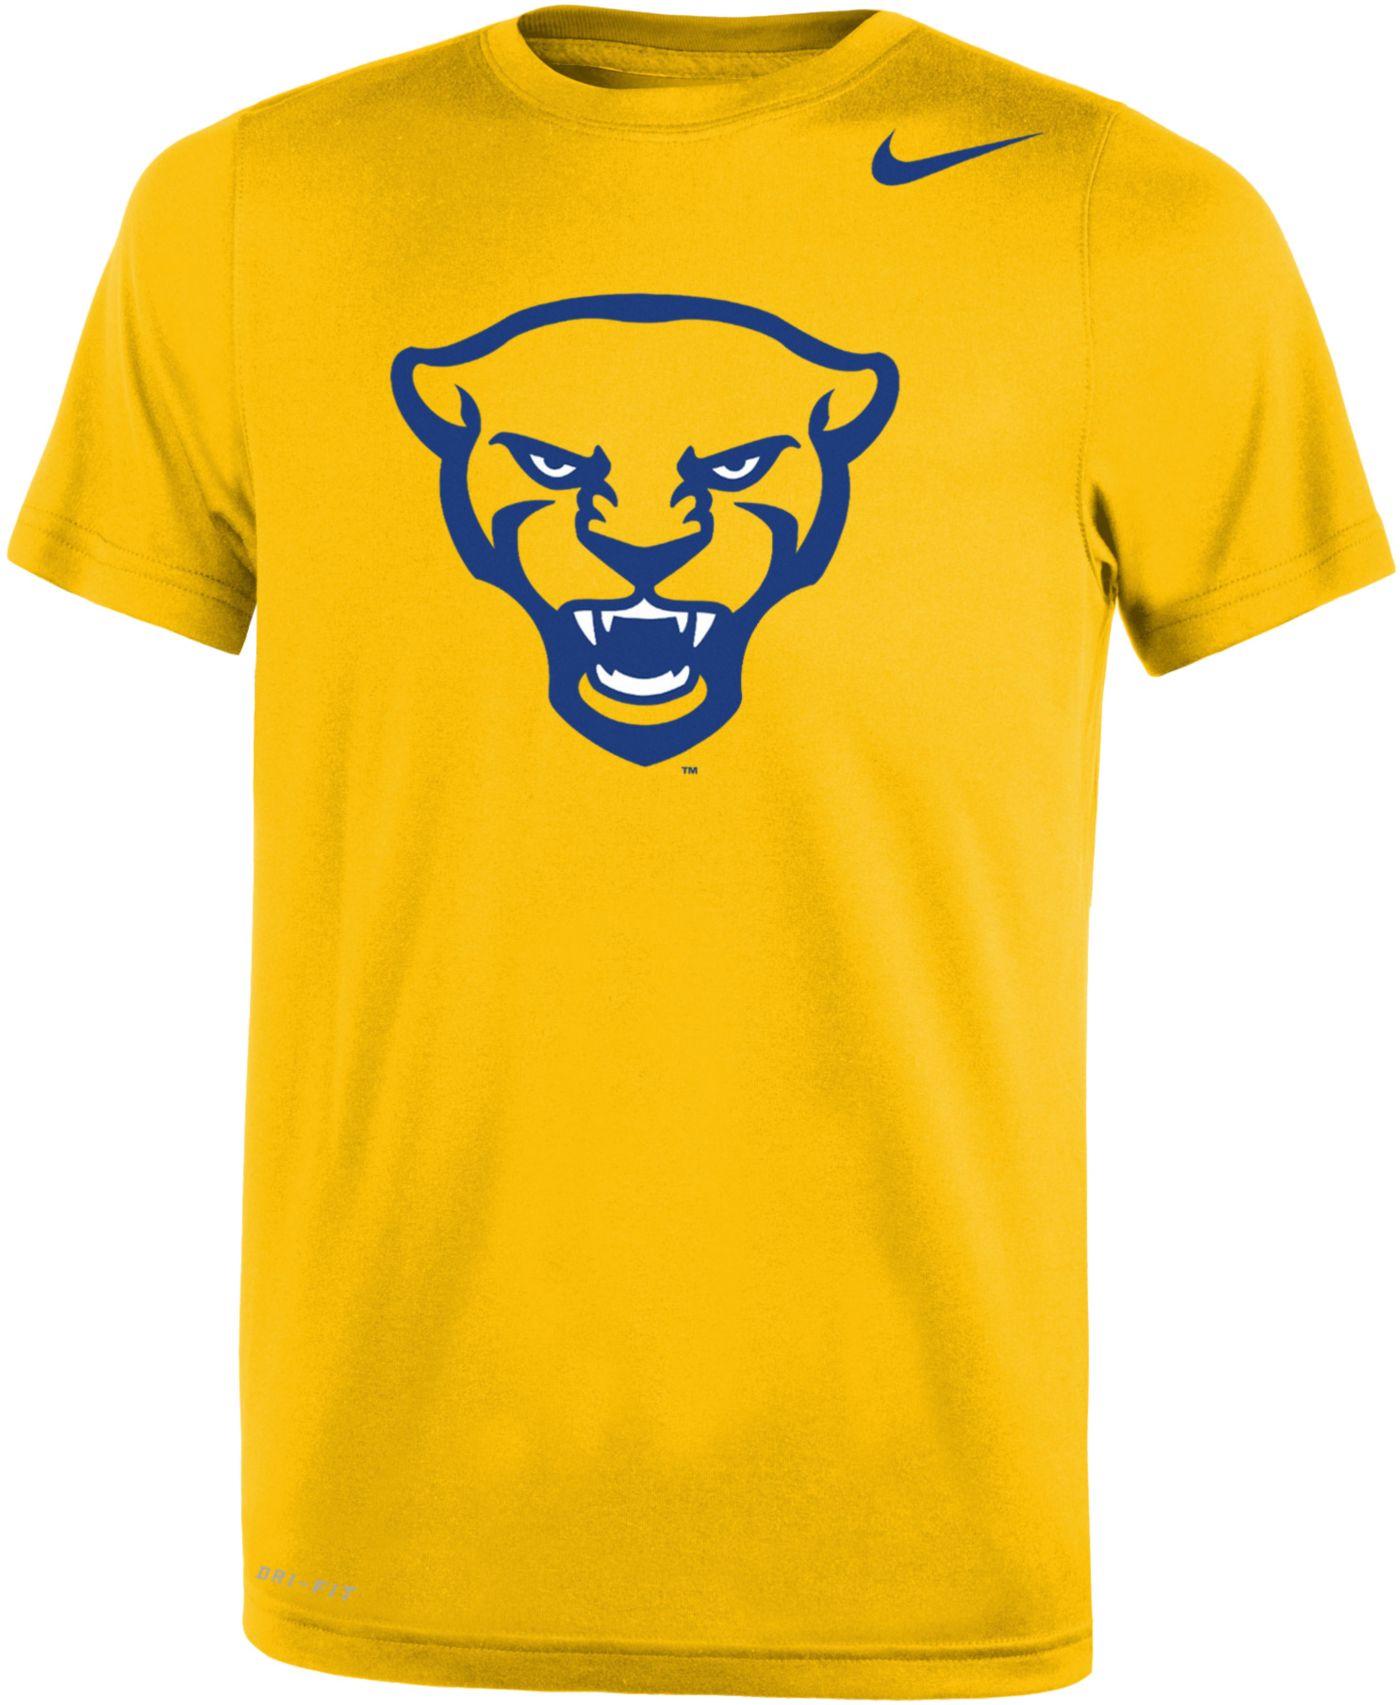 Nike Youth Pitt Panthers Gold Panther Head Logo Dri-FIT Legend 2.0 T-Shirt